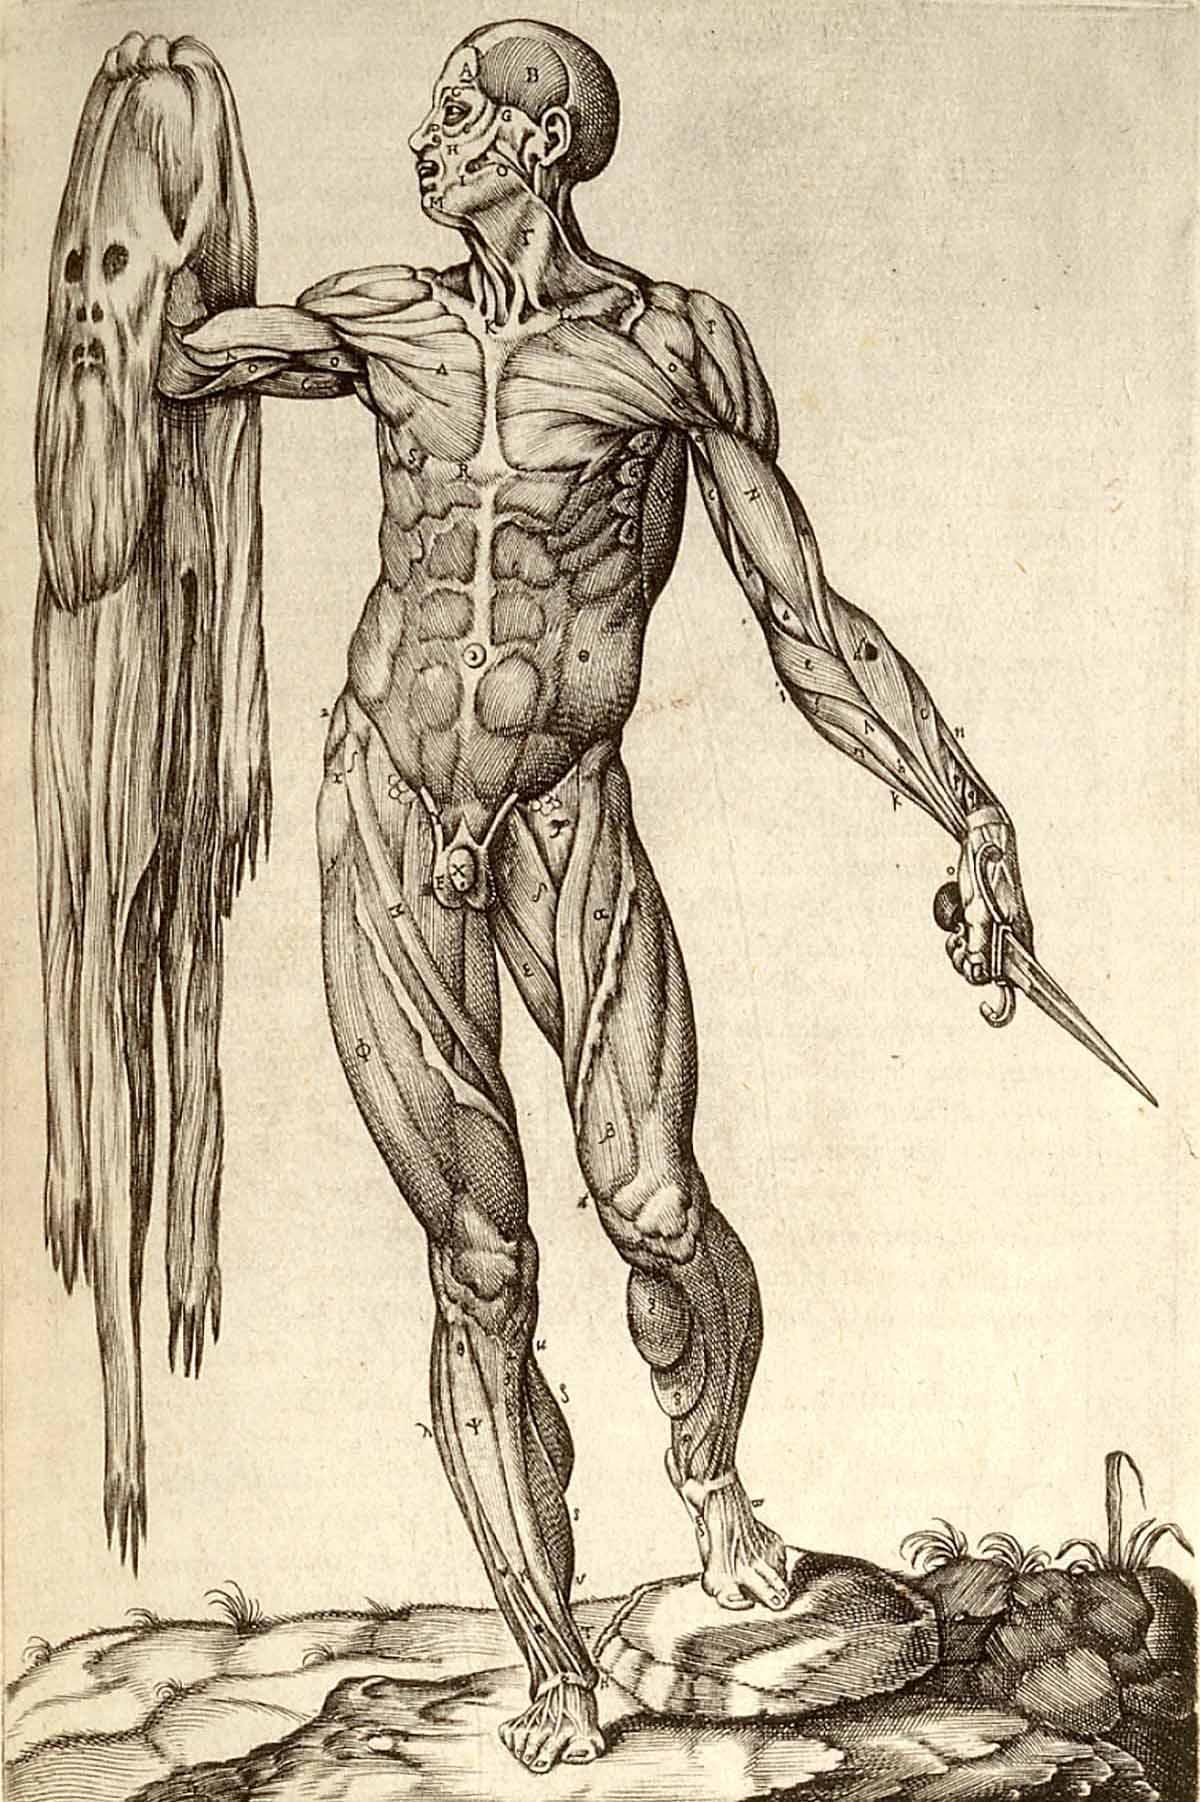 Anatomía humana [imagenes + video] - Info - Taringa!